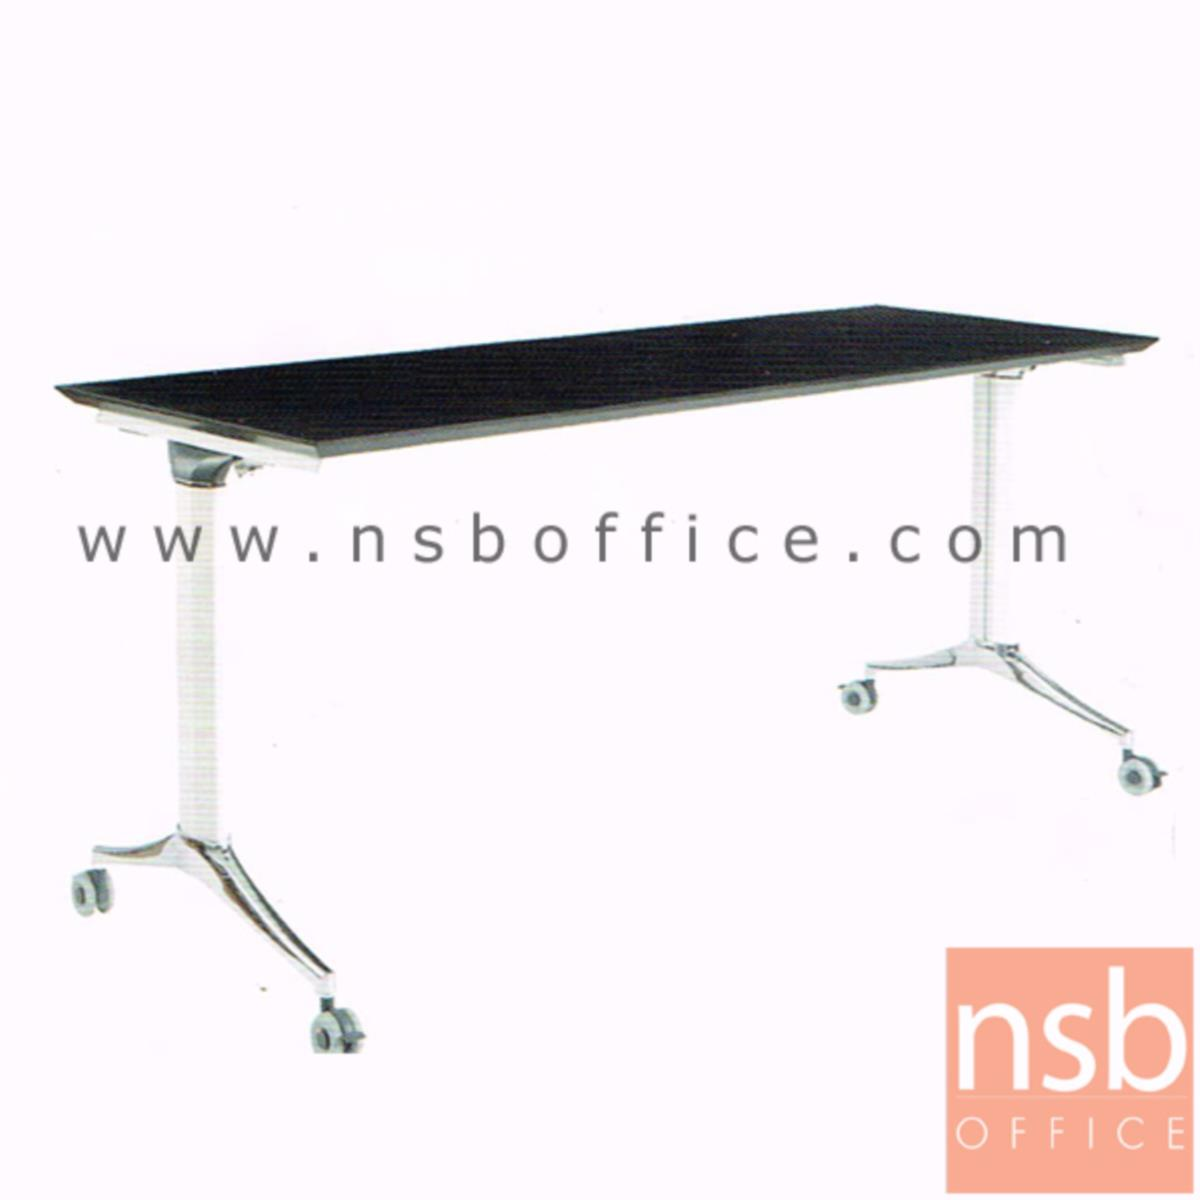 A18A080:โต๊ะประชุมพับเก็บได้ล้อเลื่อน  ขนาด 120W ,160W ,180W cm.  ขาผลิตจากอลูมินั่ม